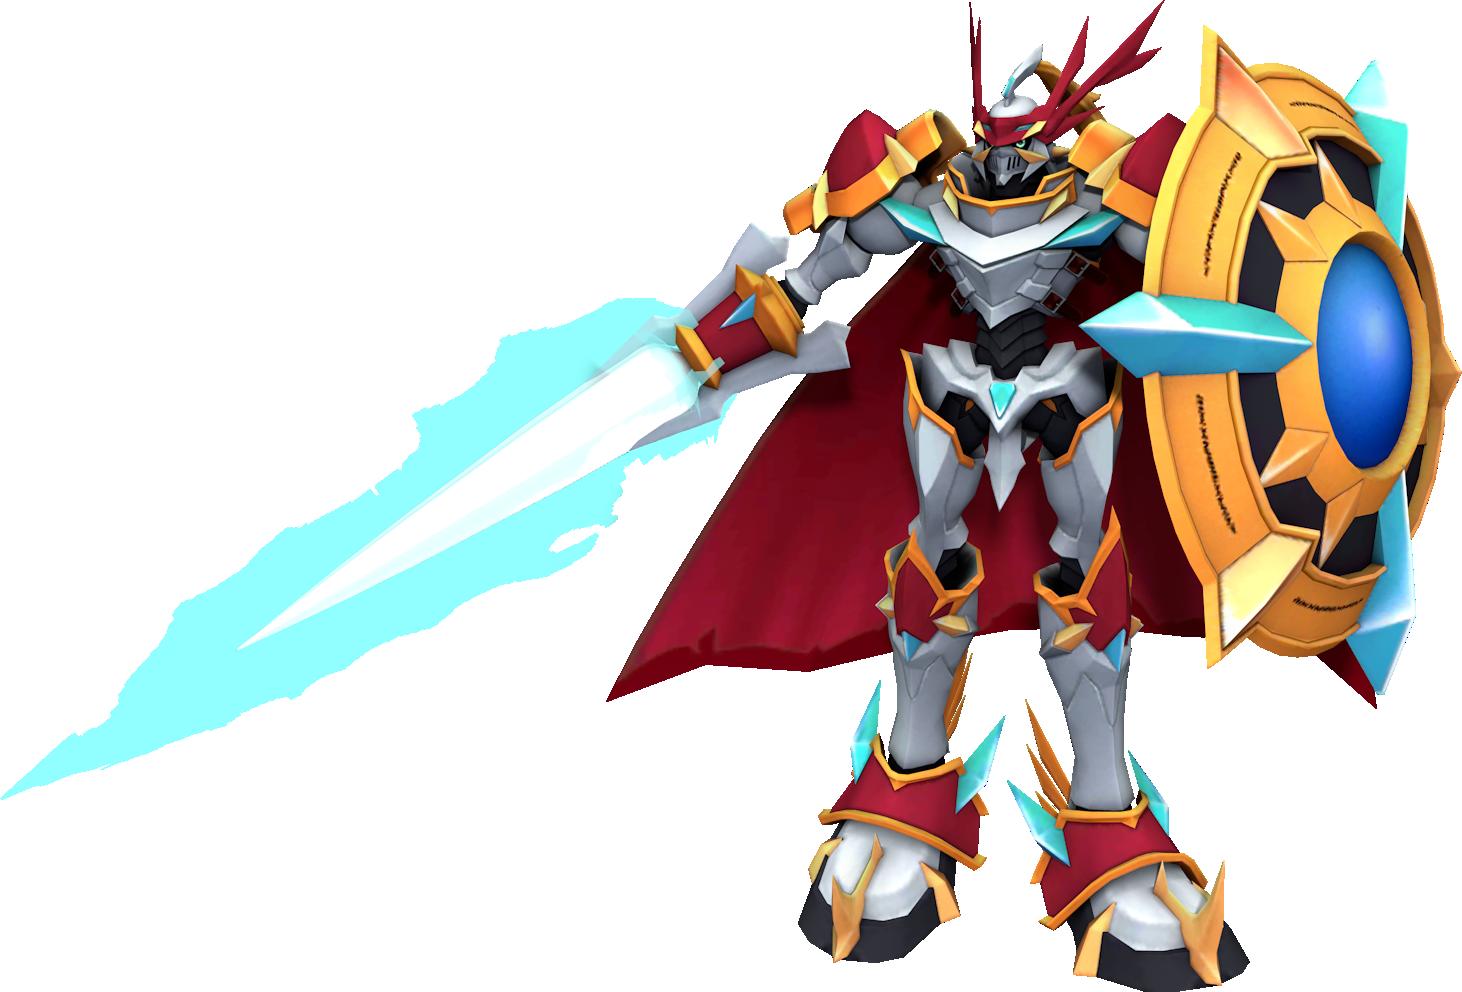 Dukemon Cosplay Costume from Digimon